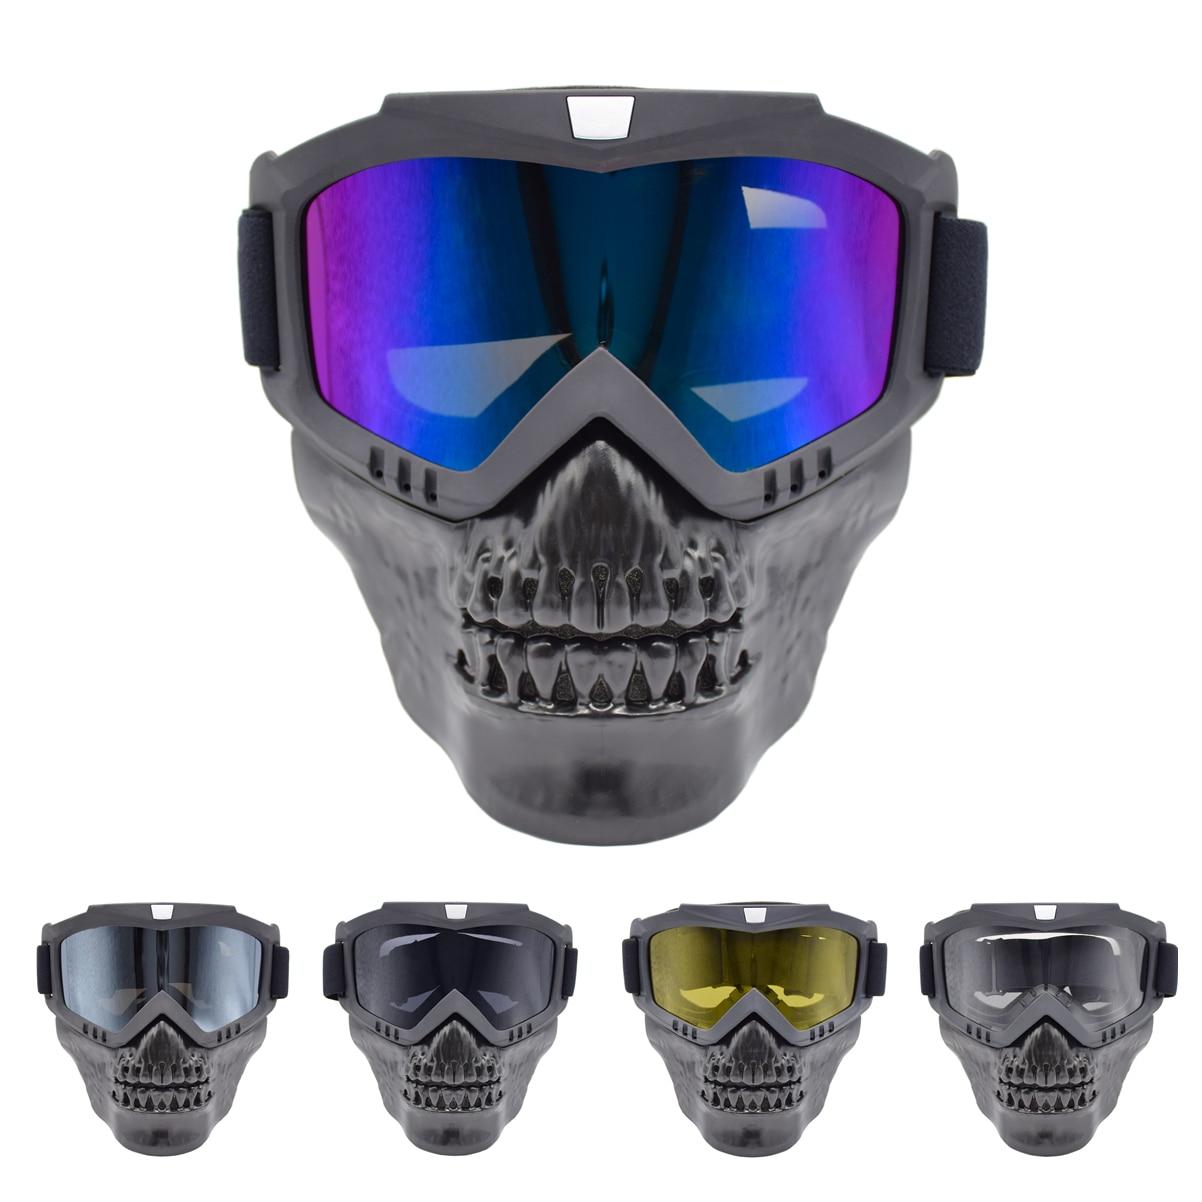 Unisex Skiing Goggles Modular Mask Detachable Mouth Filter Men Women Ski Snowmobile Snowboard Goggles Snow Winter Ski Glasses